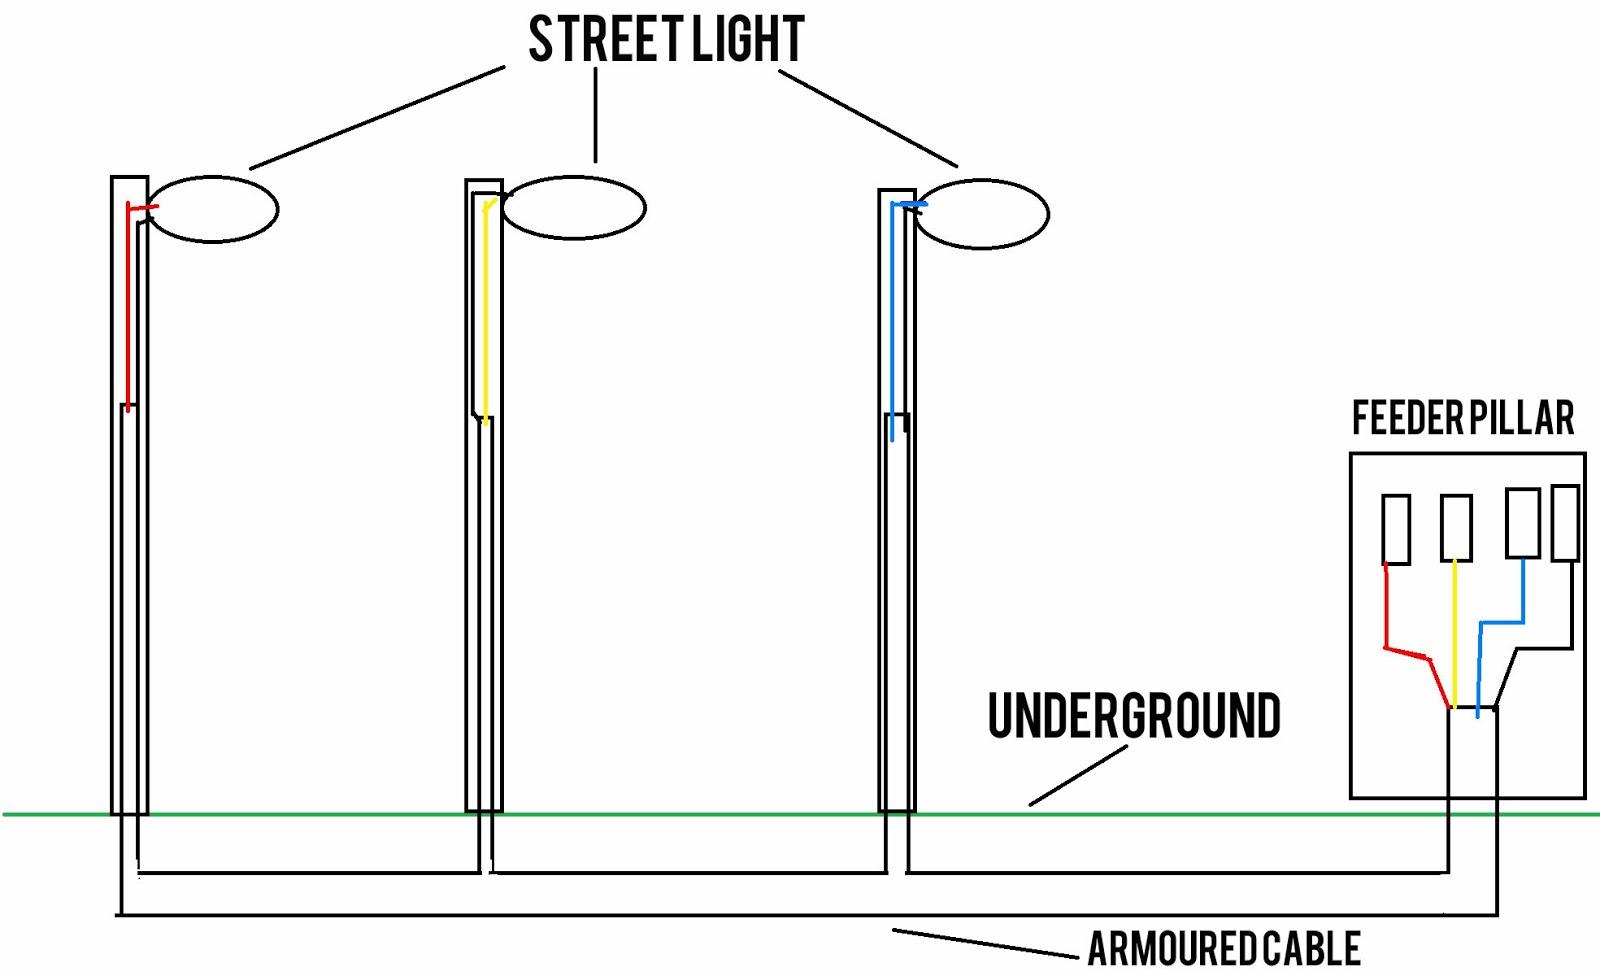 Street Lighting Circuit Wiring Diagram 99 Mustang Headlight Underground